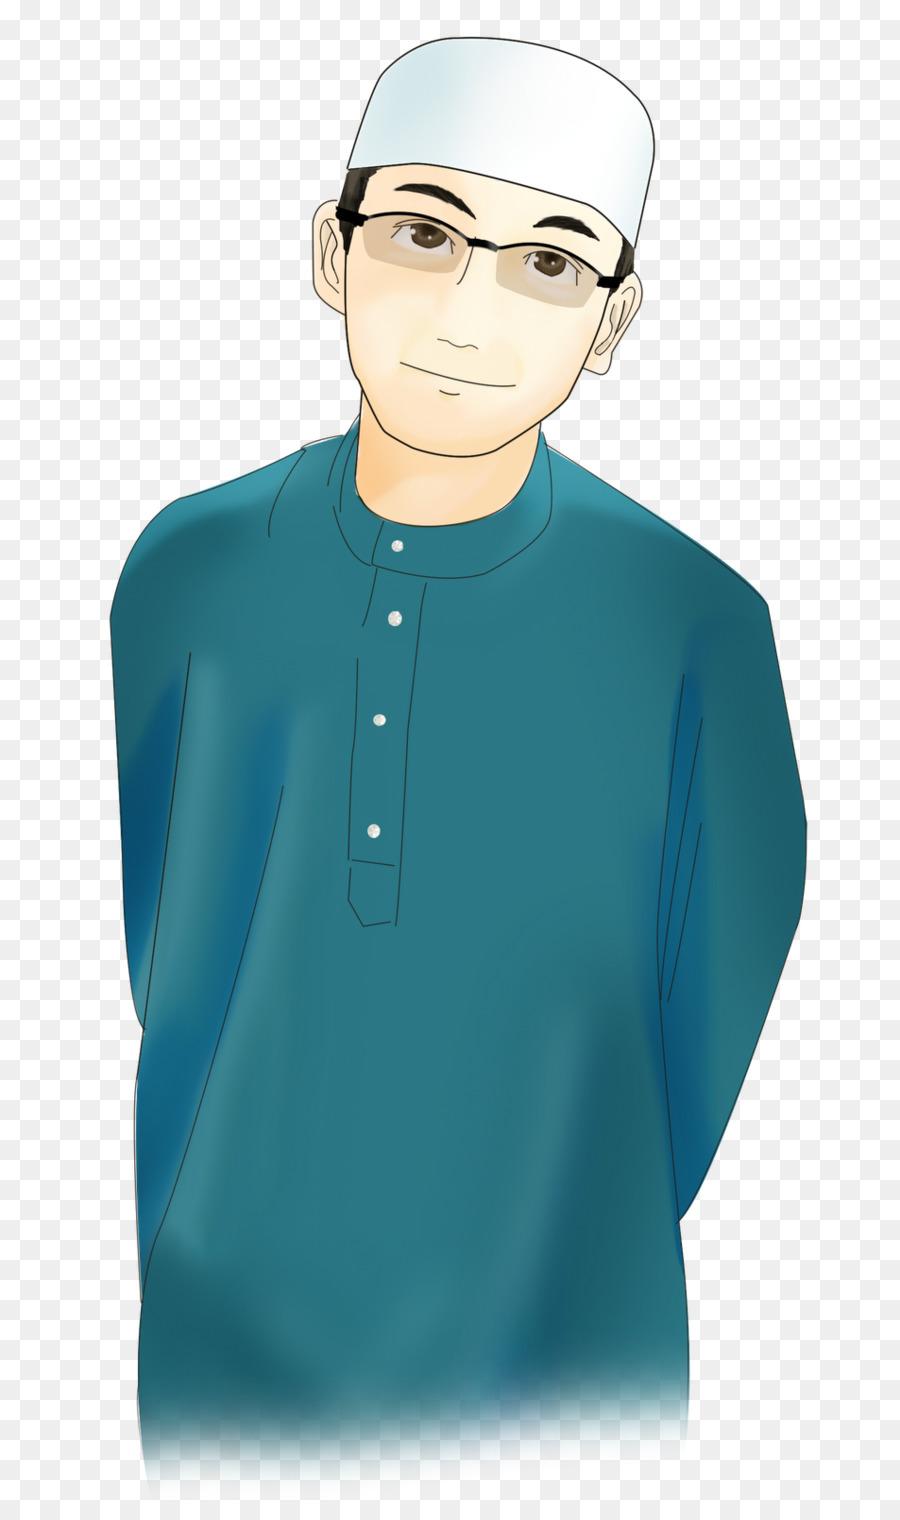 Foto Kartun Laki Laki Islami